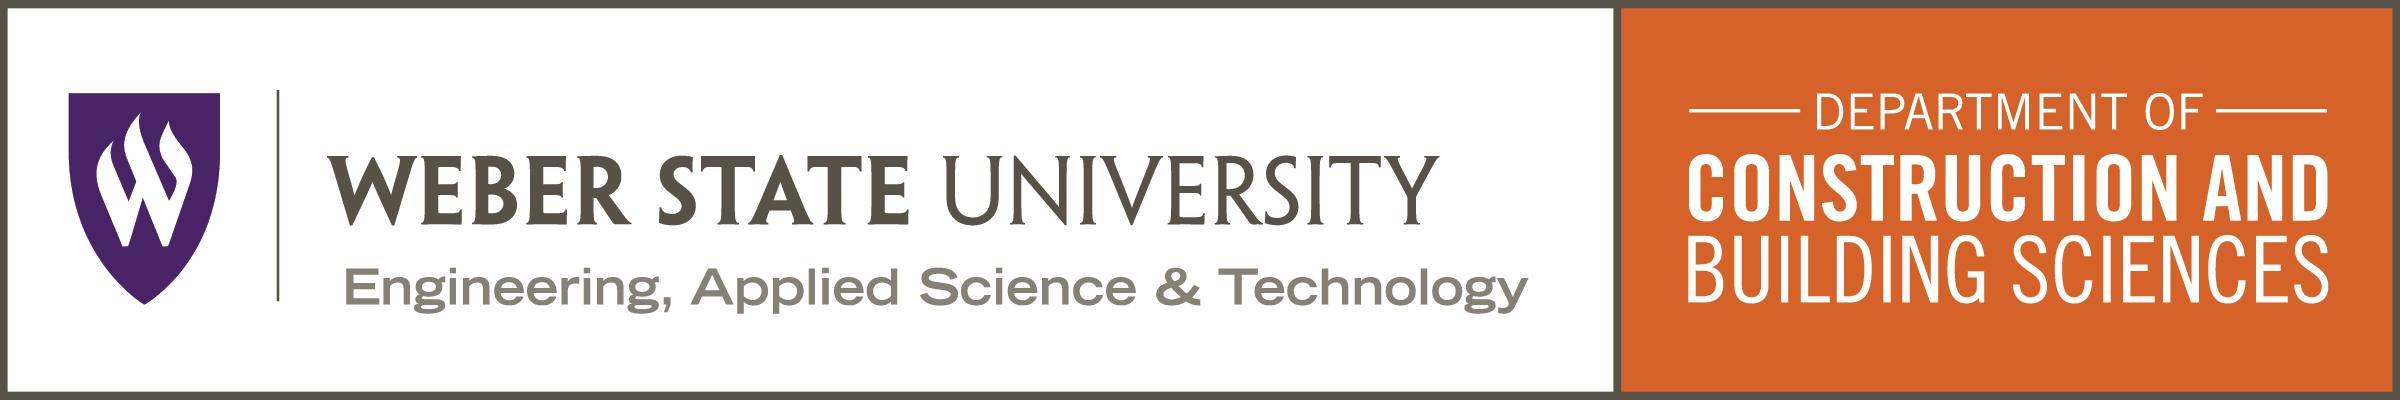 weber-state-logo